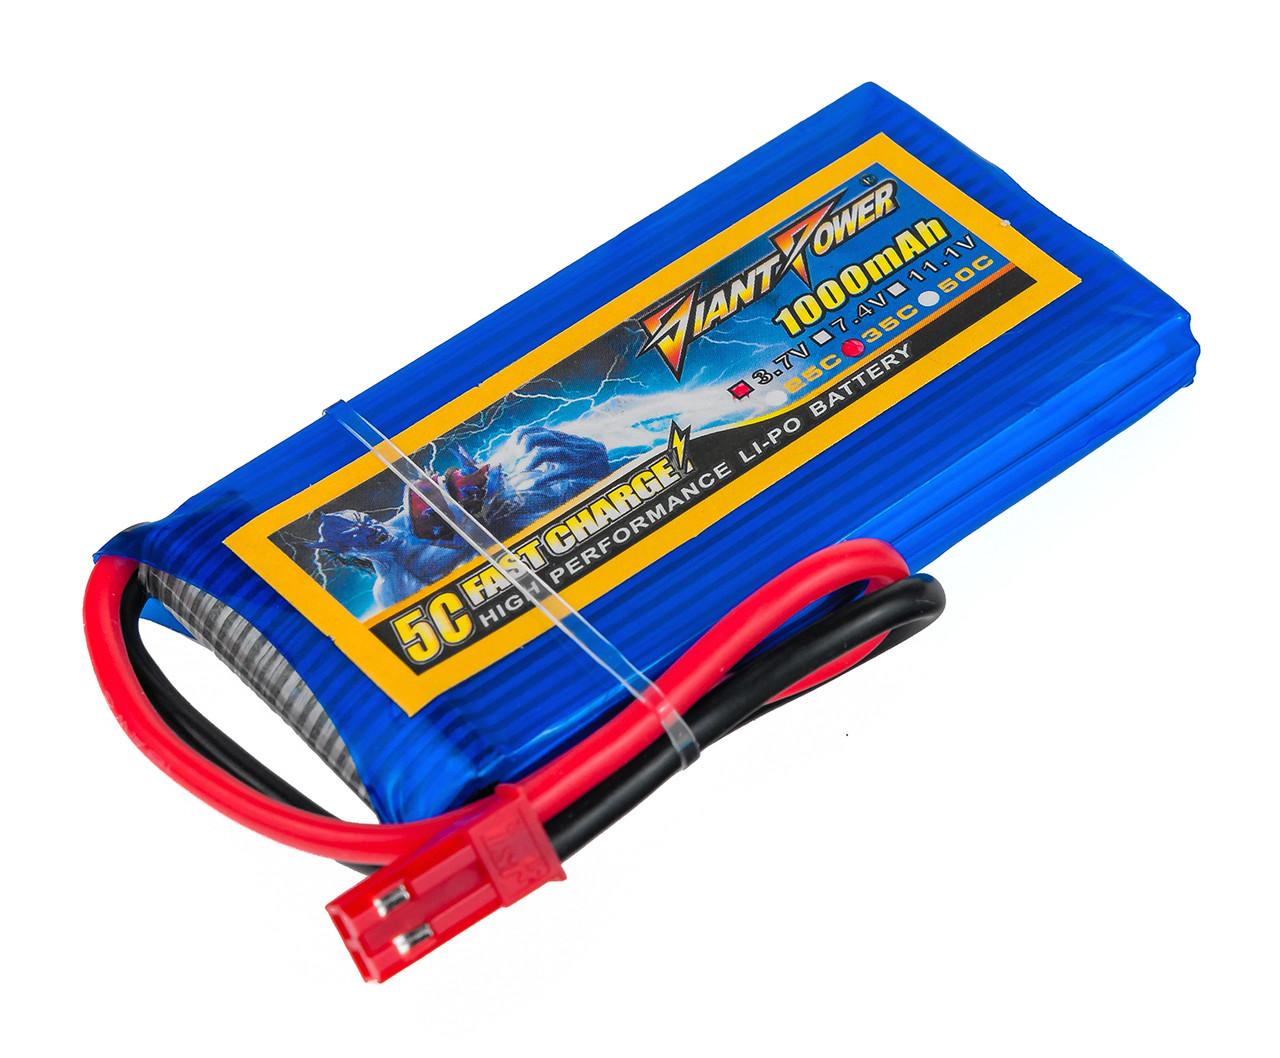 Аккумулятор Giant Power Li-Pol 1000mAh 3.7V 1S 35C 8x34x65мм JST